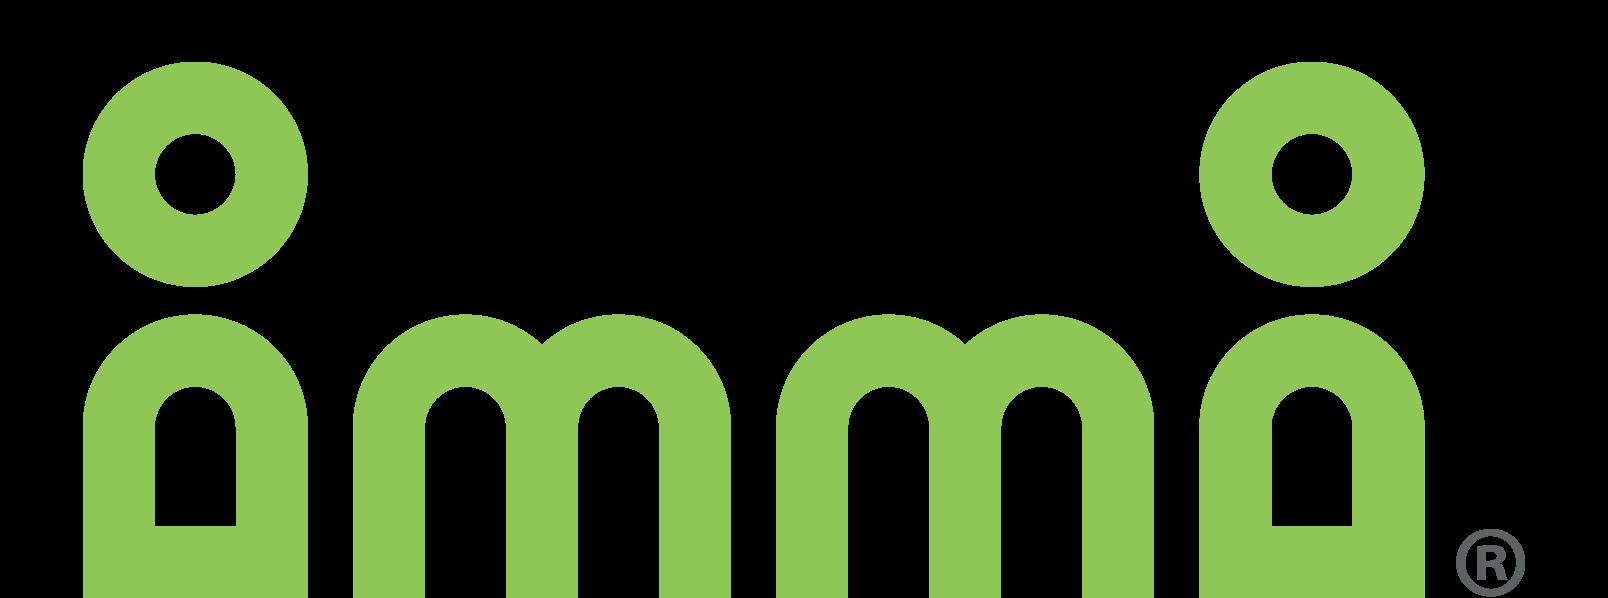 Immi Logo